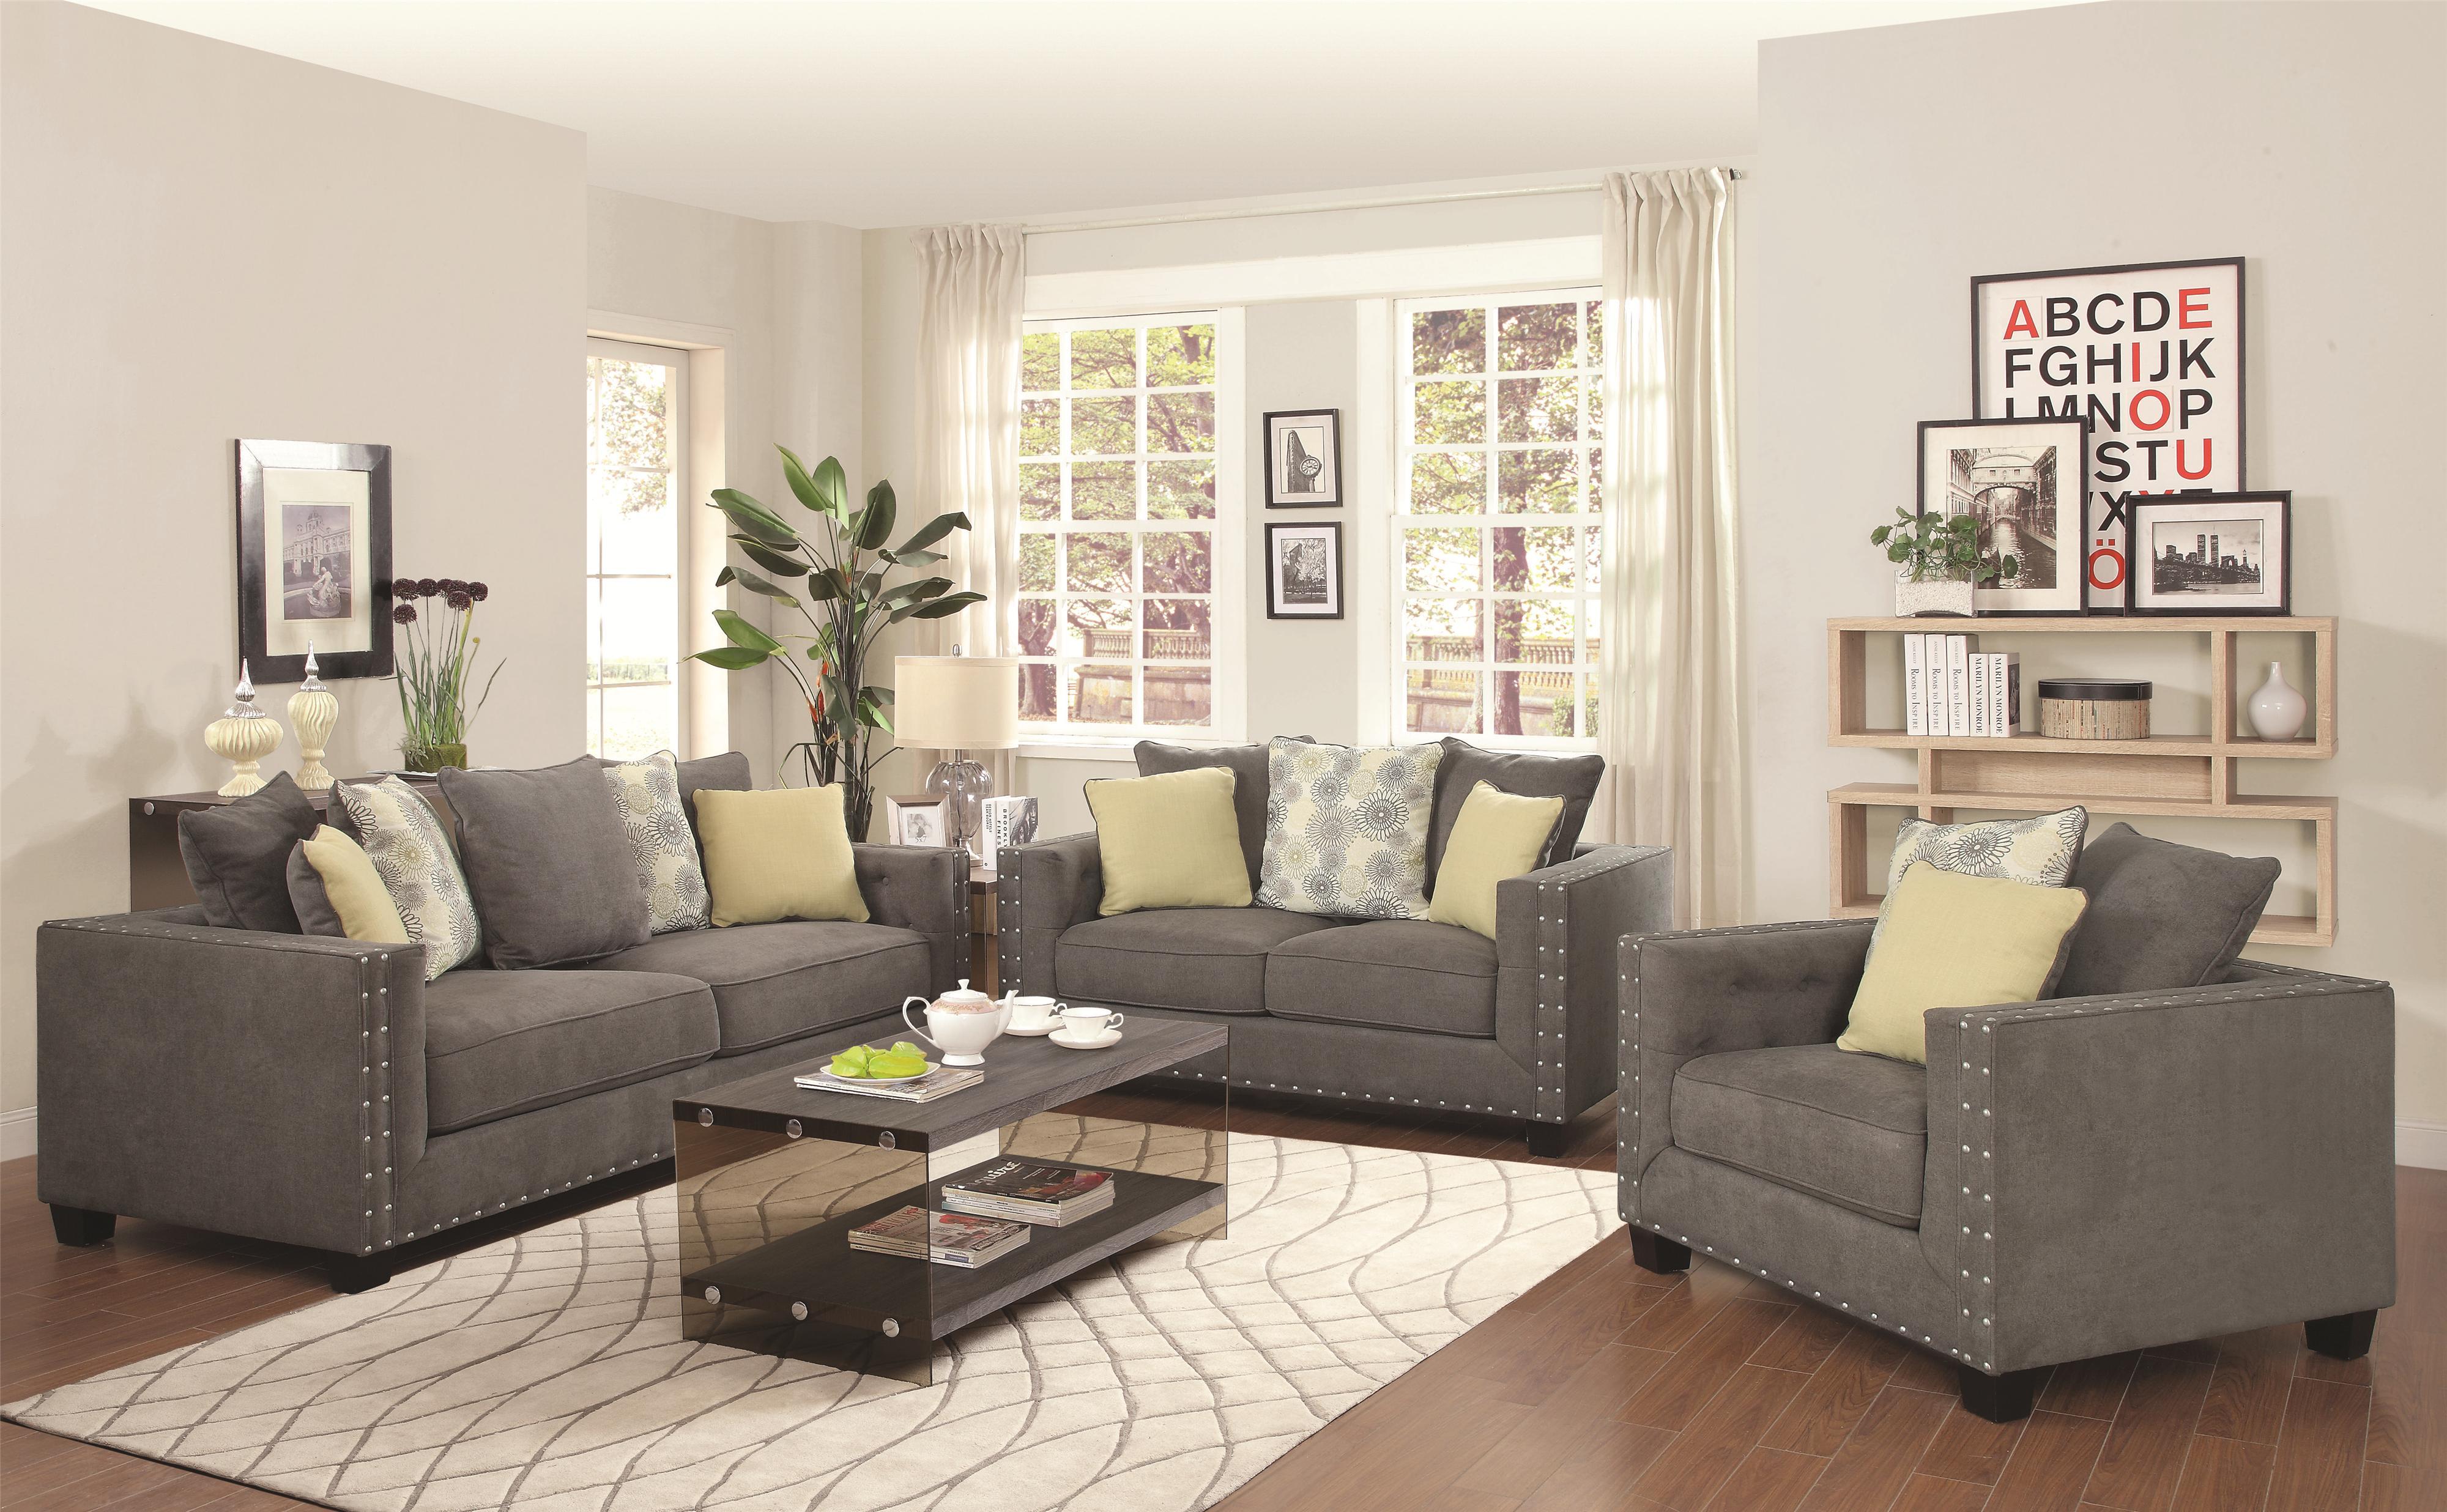 Coaster Kelvington Stationary Living Room Group - Item Number: 50142 Living Room Group 1